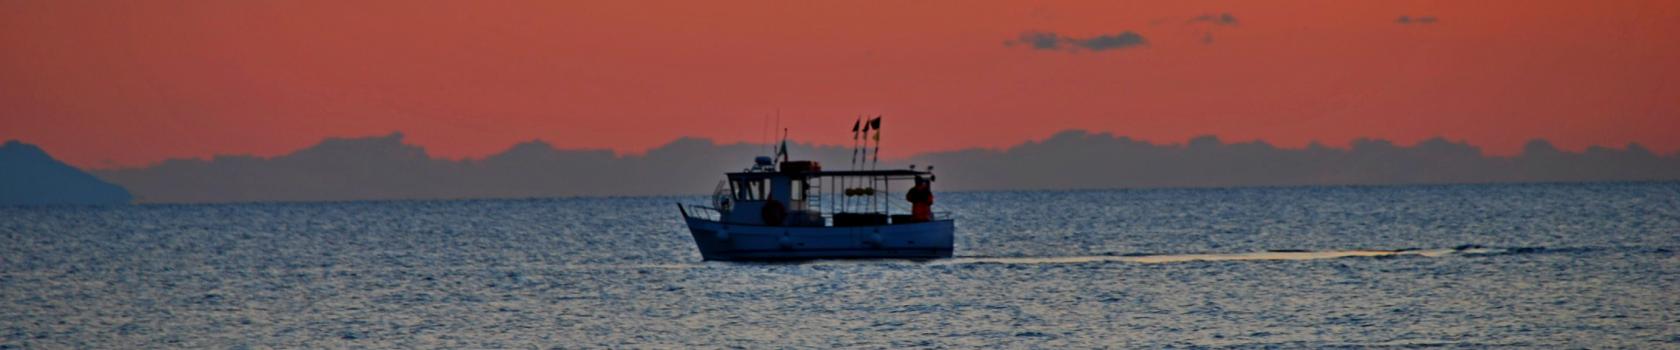 follonica-tramonto